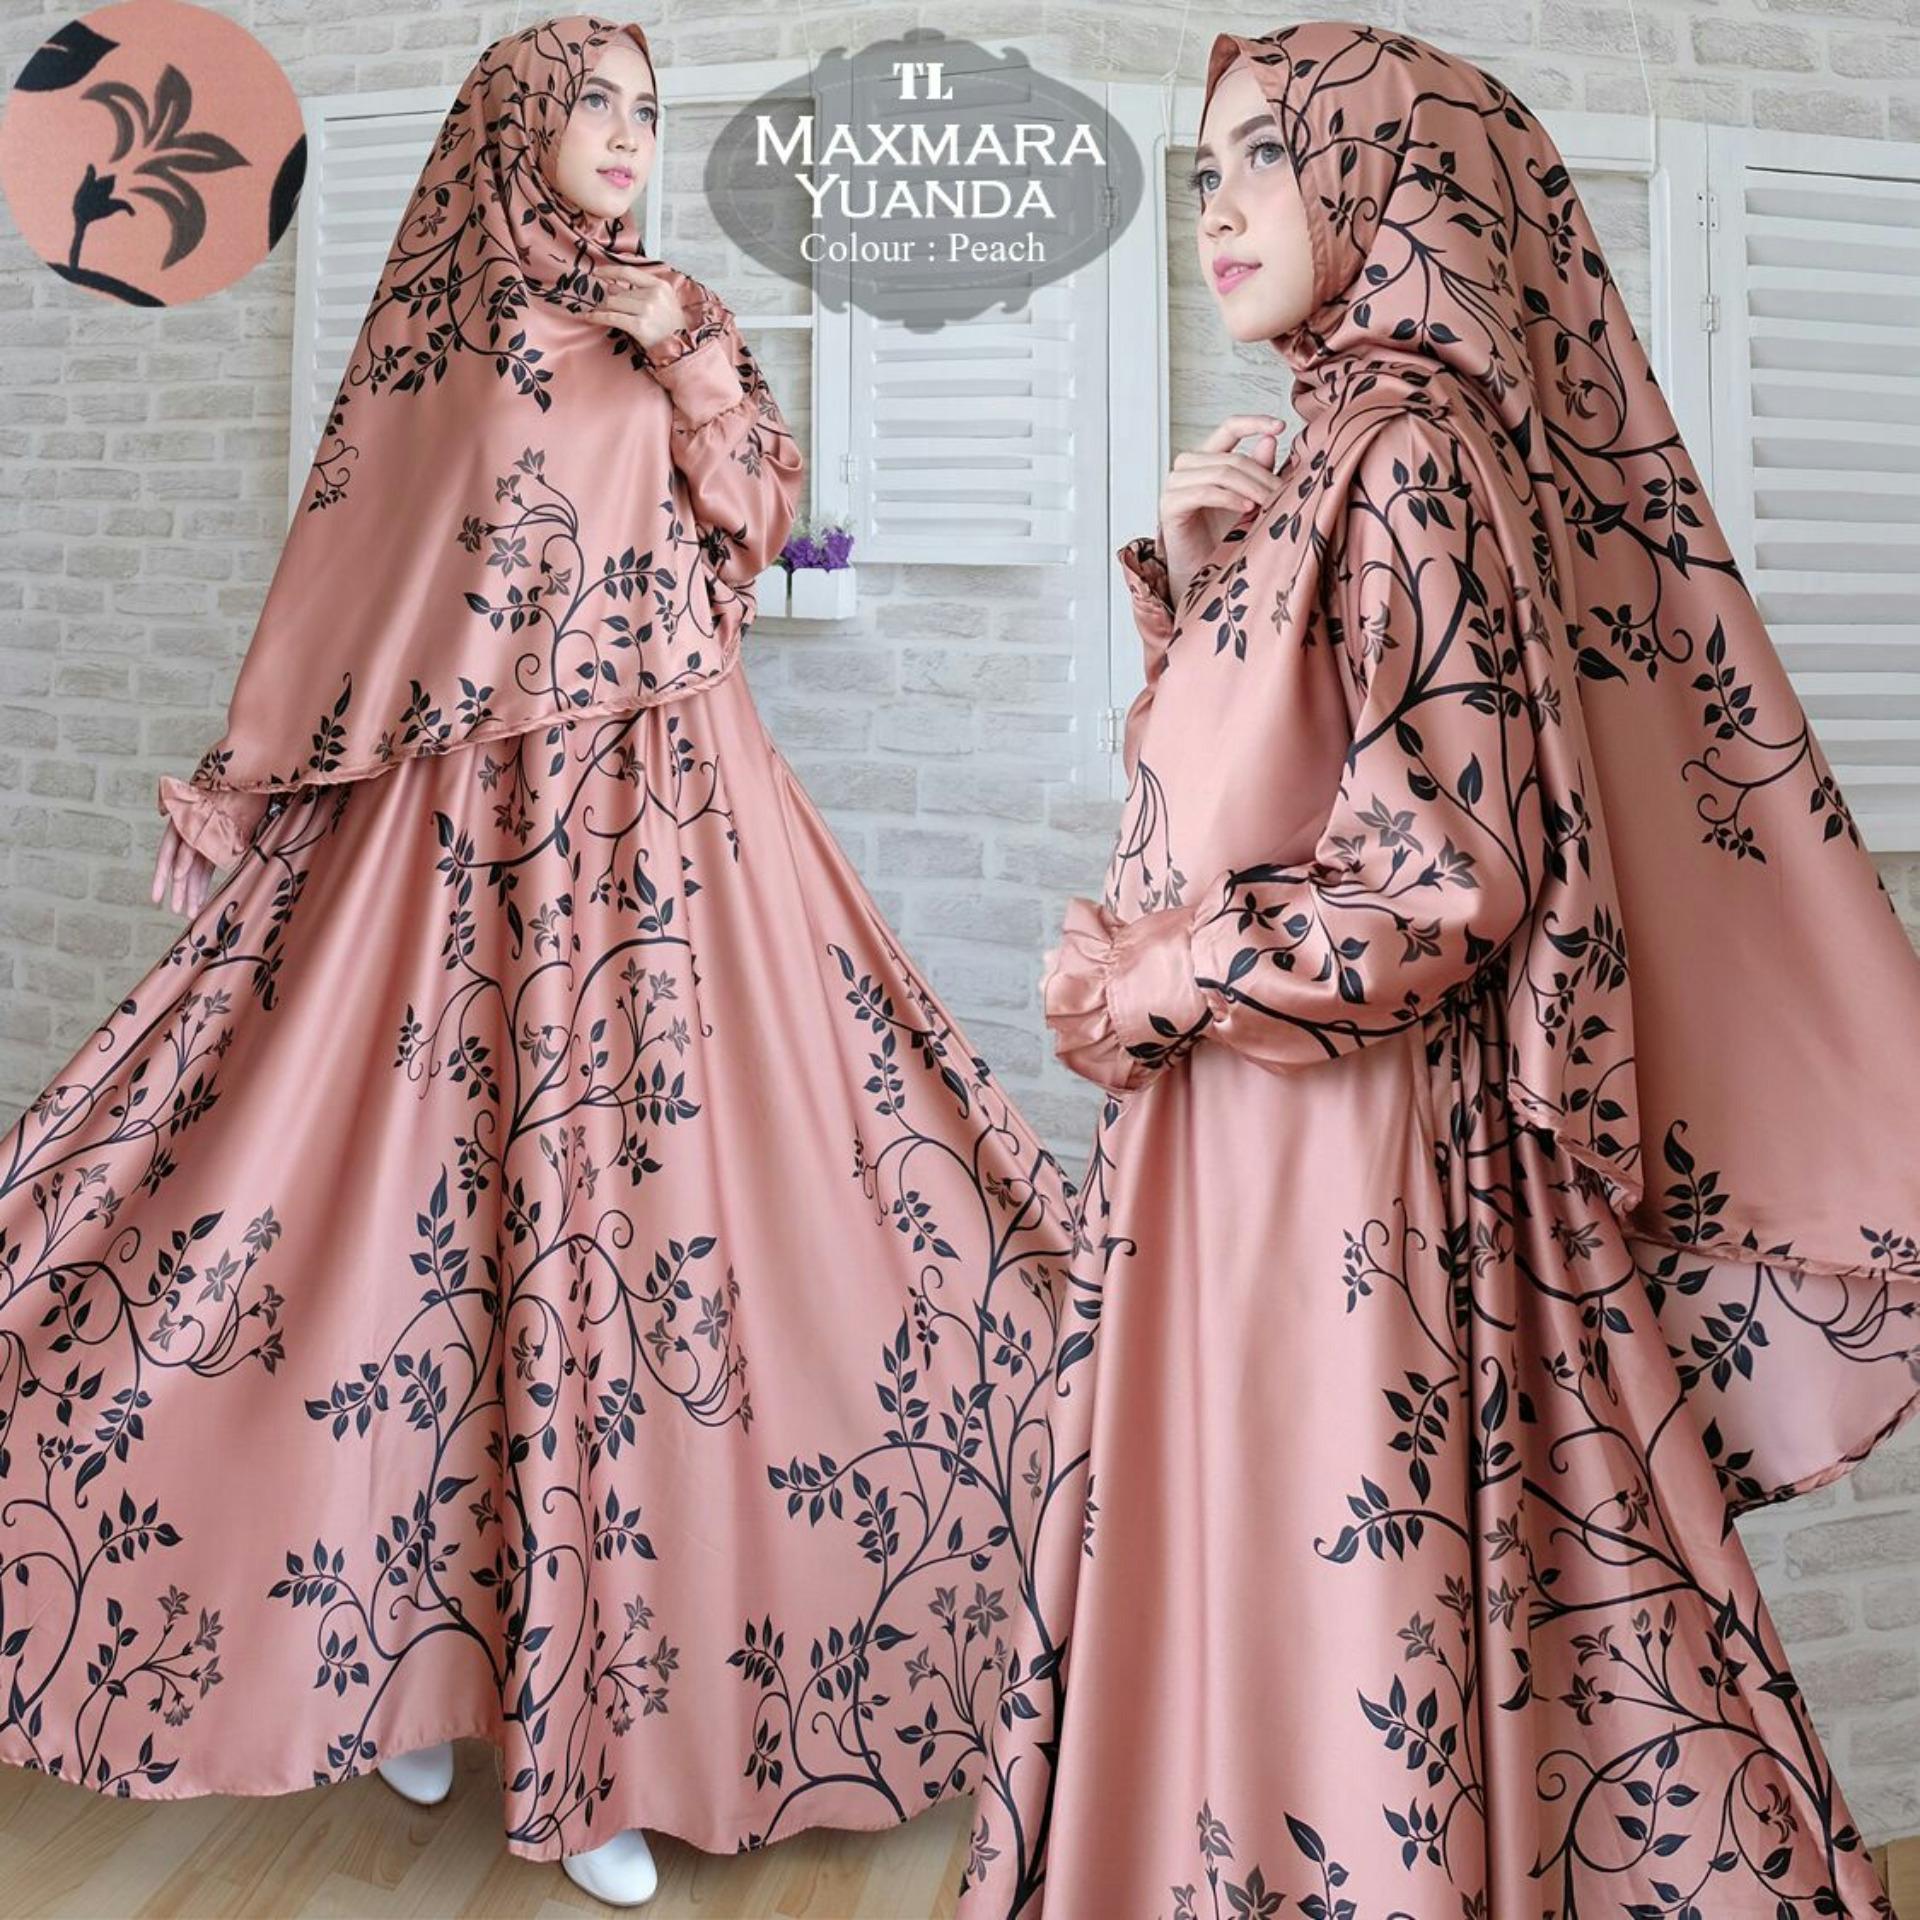 Ofashion Pakaian Muslim AX-5051 Gamis Dokalyn Bubble Gaun Lebaran Muslimah -. Source ·